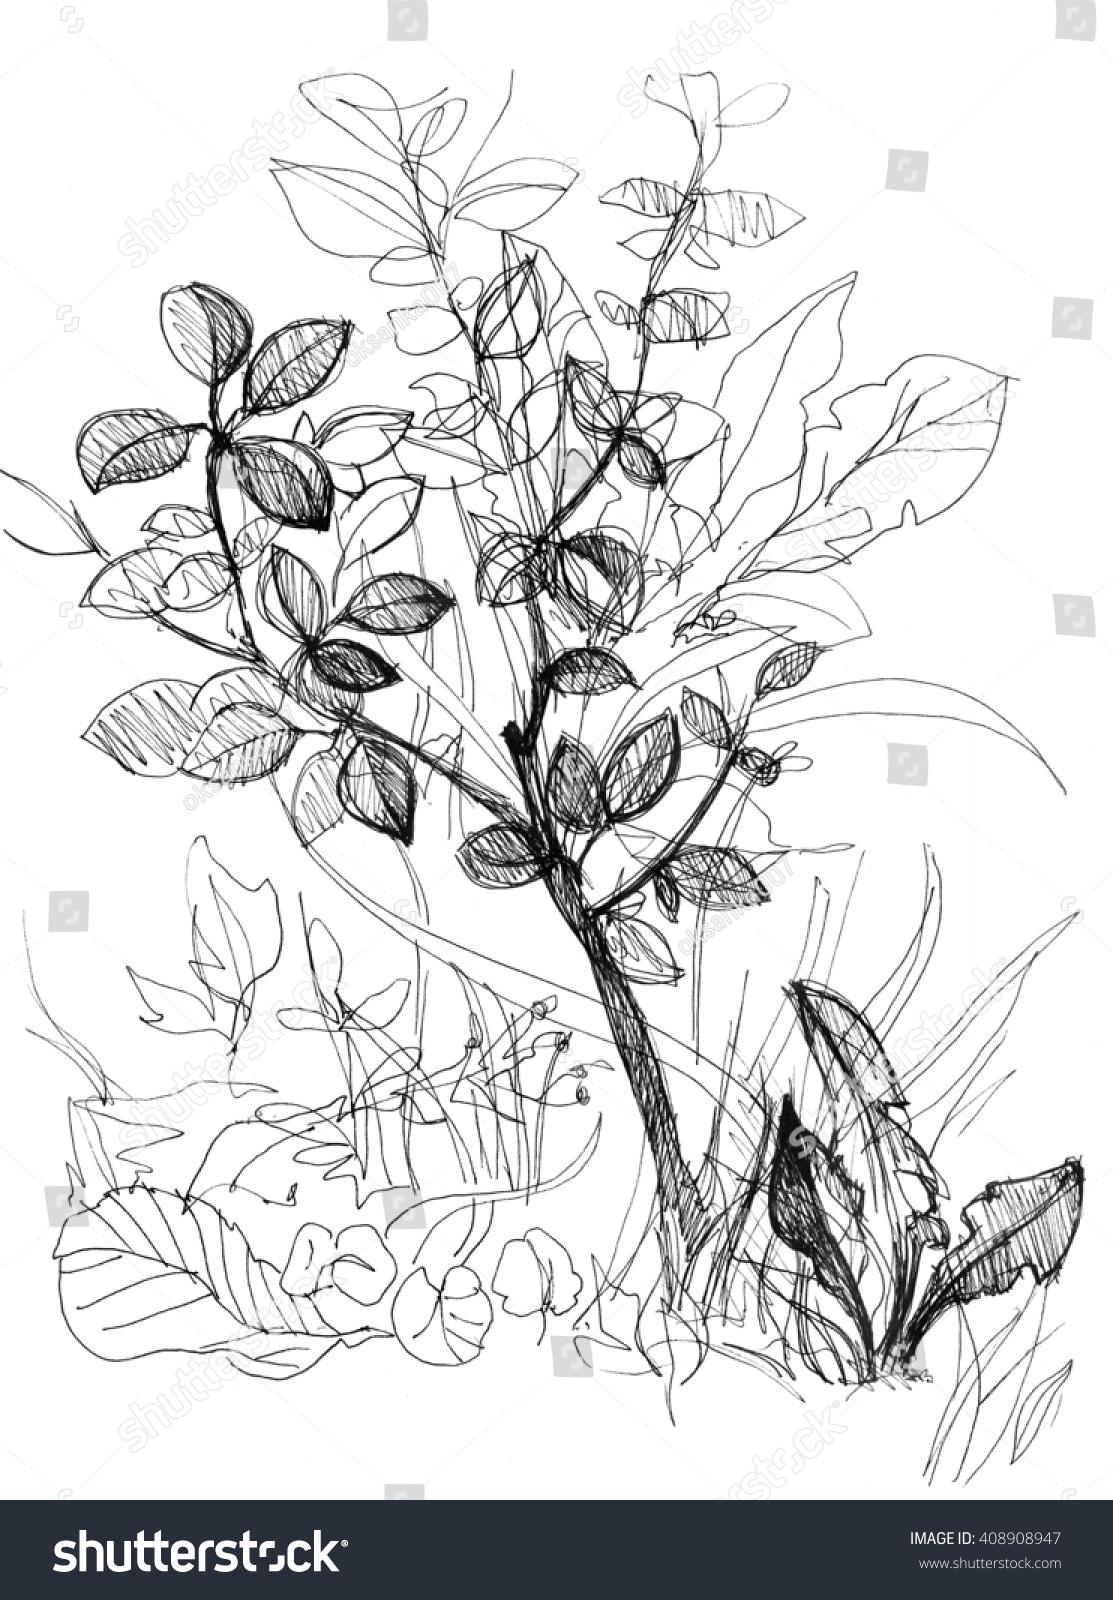 Botanical art coloring book - Detailed Forest Illustration Hand Drawn Amazing Botanical Artwork